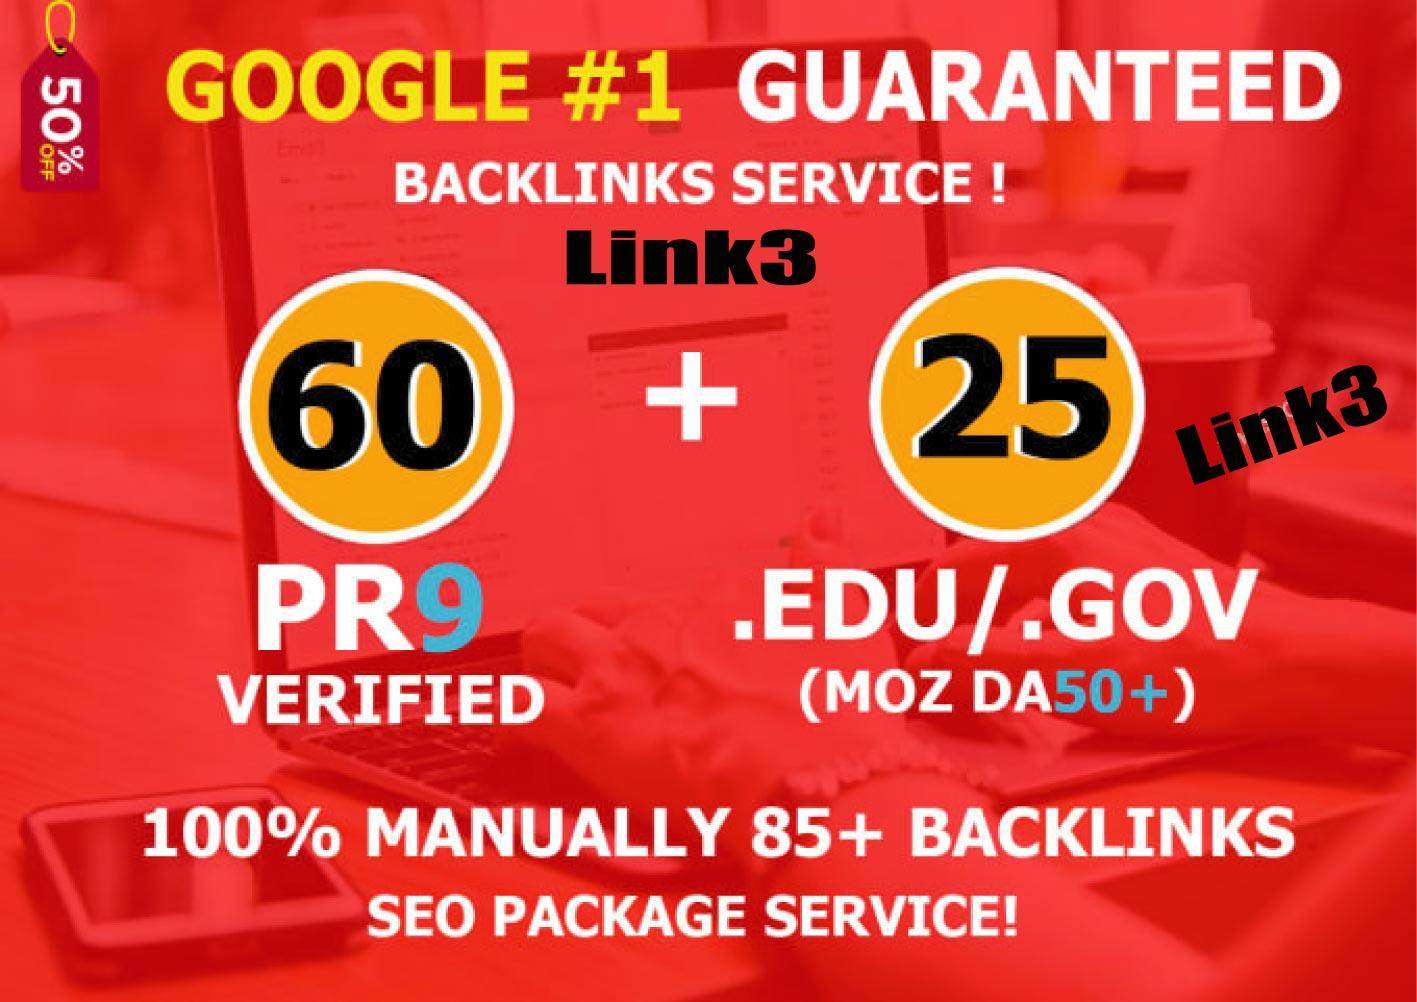 Manually created 85 Backlinks 60 PR9 BACKLINKS with 25 Edu-Gov Links